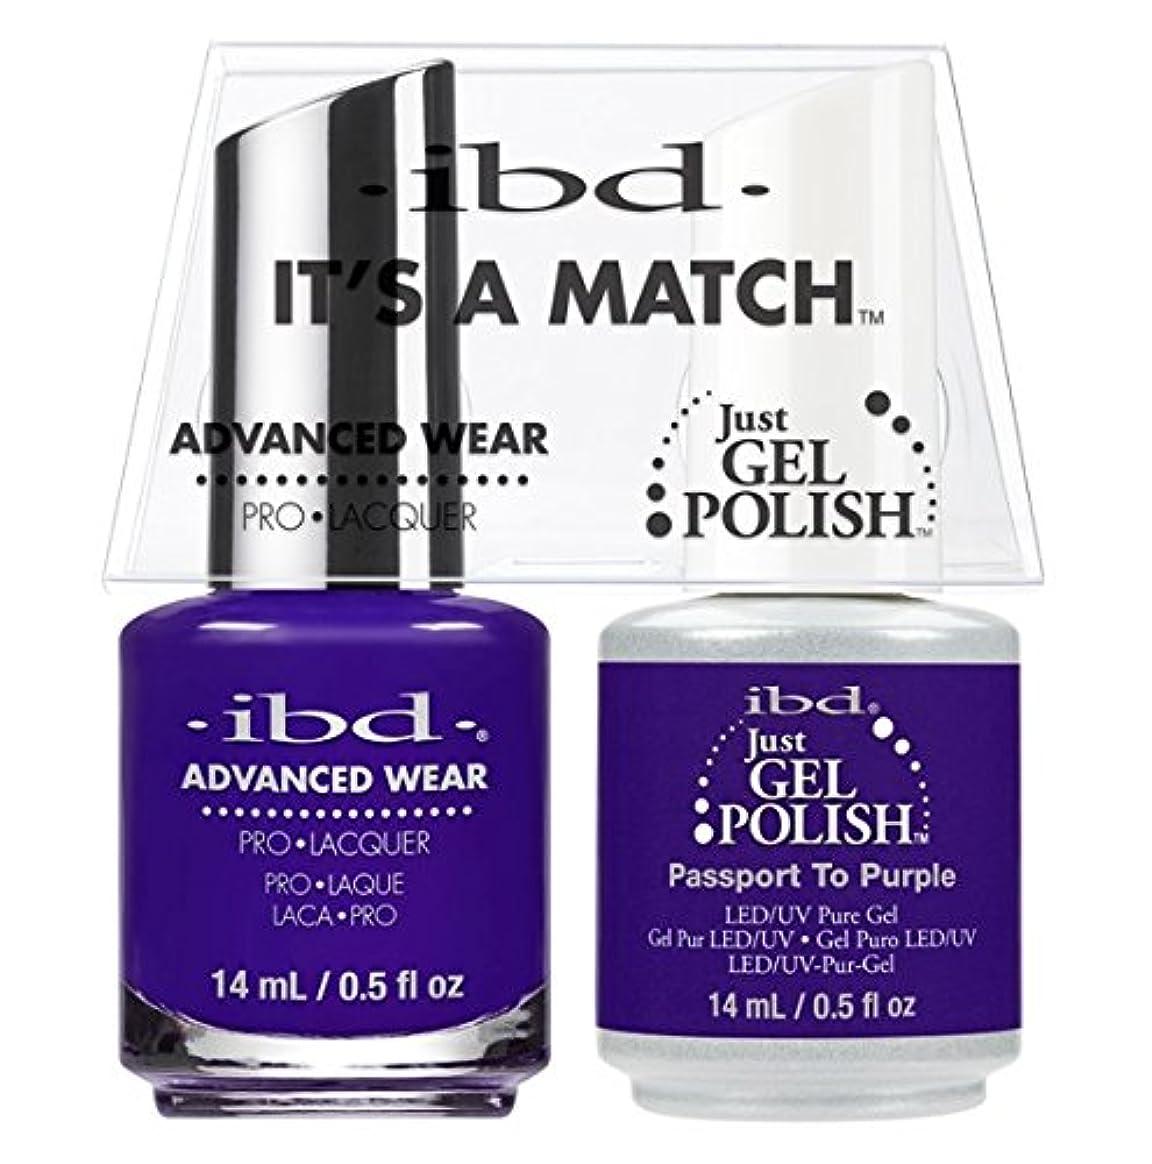 ibd - It's A Match -Duo Pack- Passport to Purple - 14 mL / 0.5 oz Each